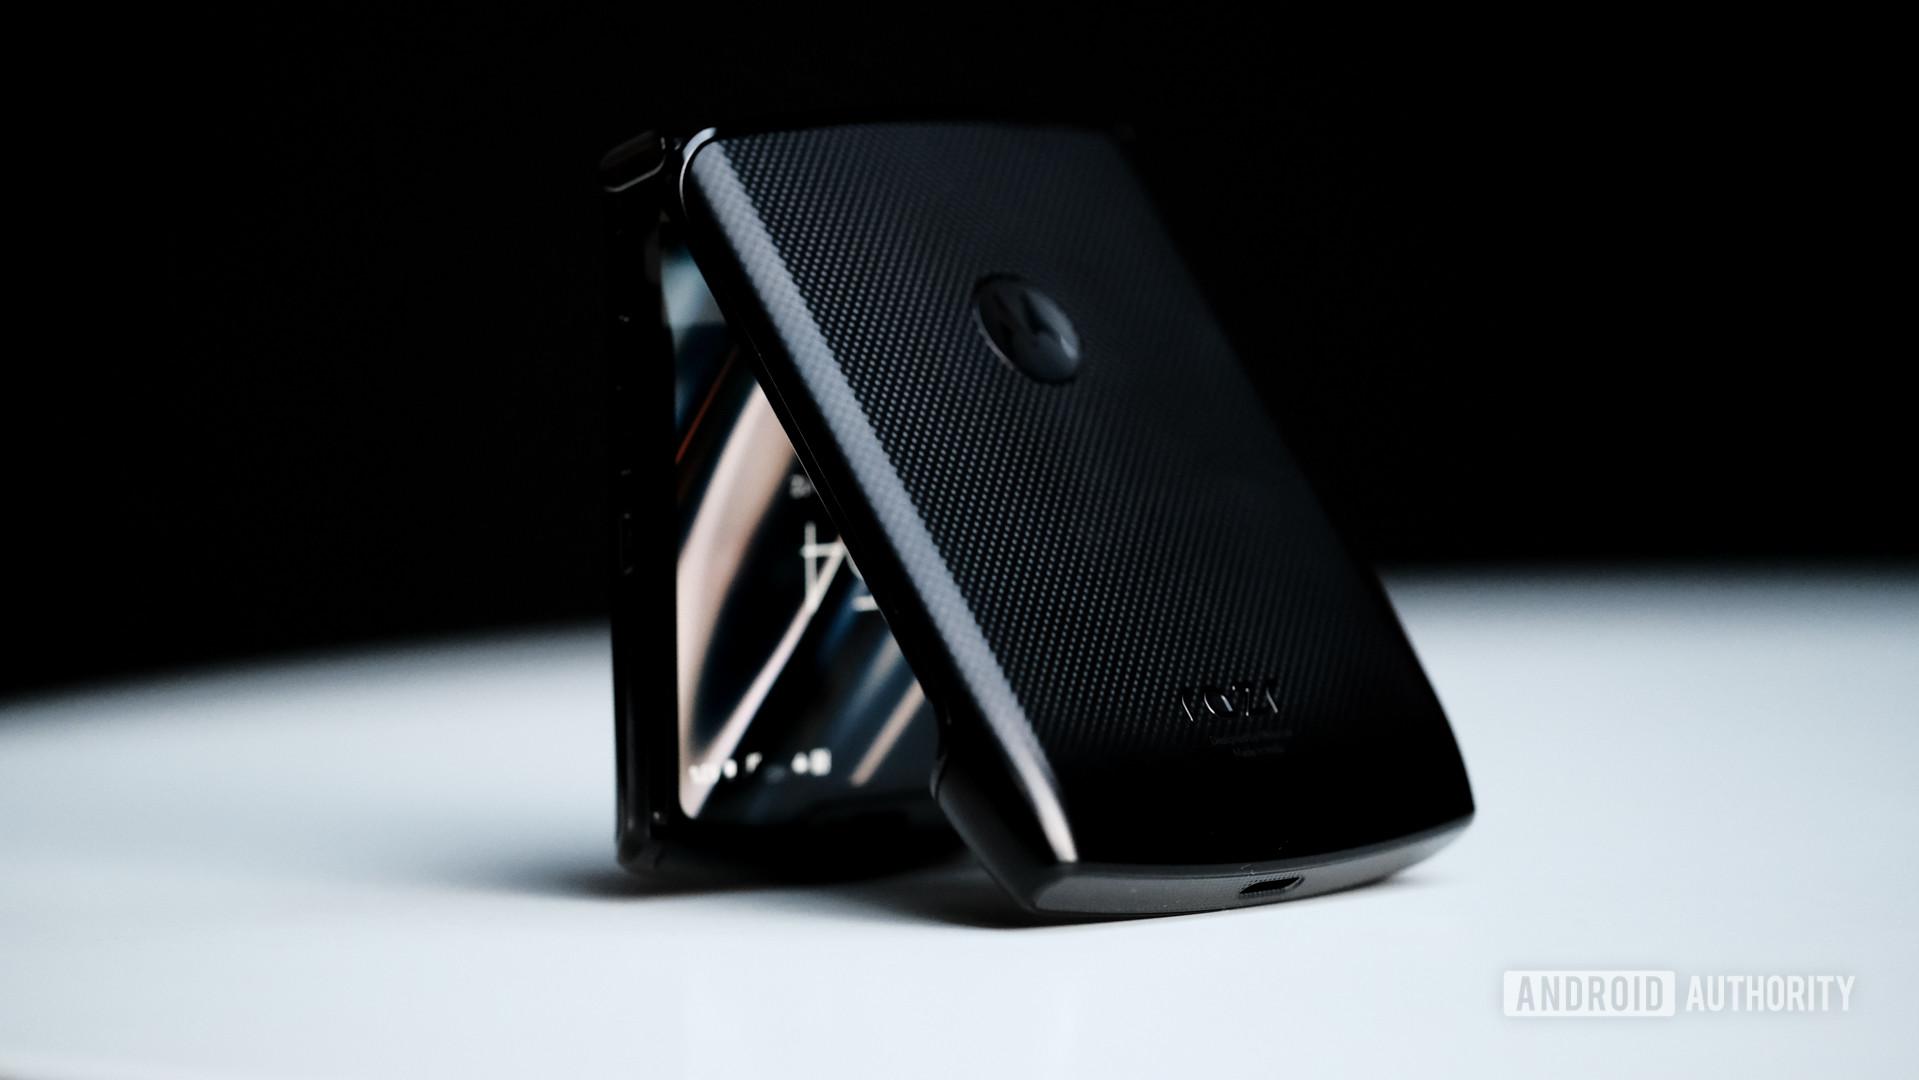 Motorola Moto Razr preorders start on January 26 at Verizon